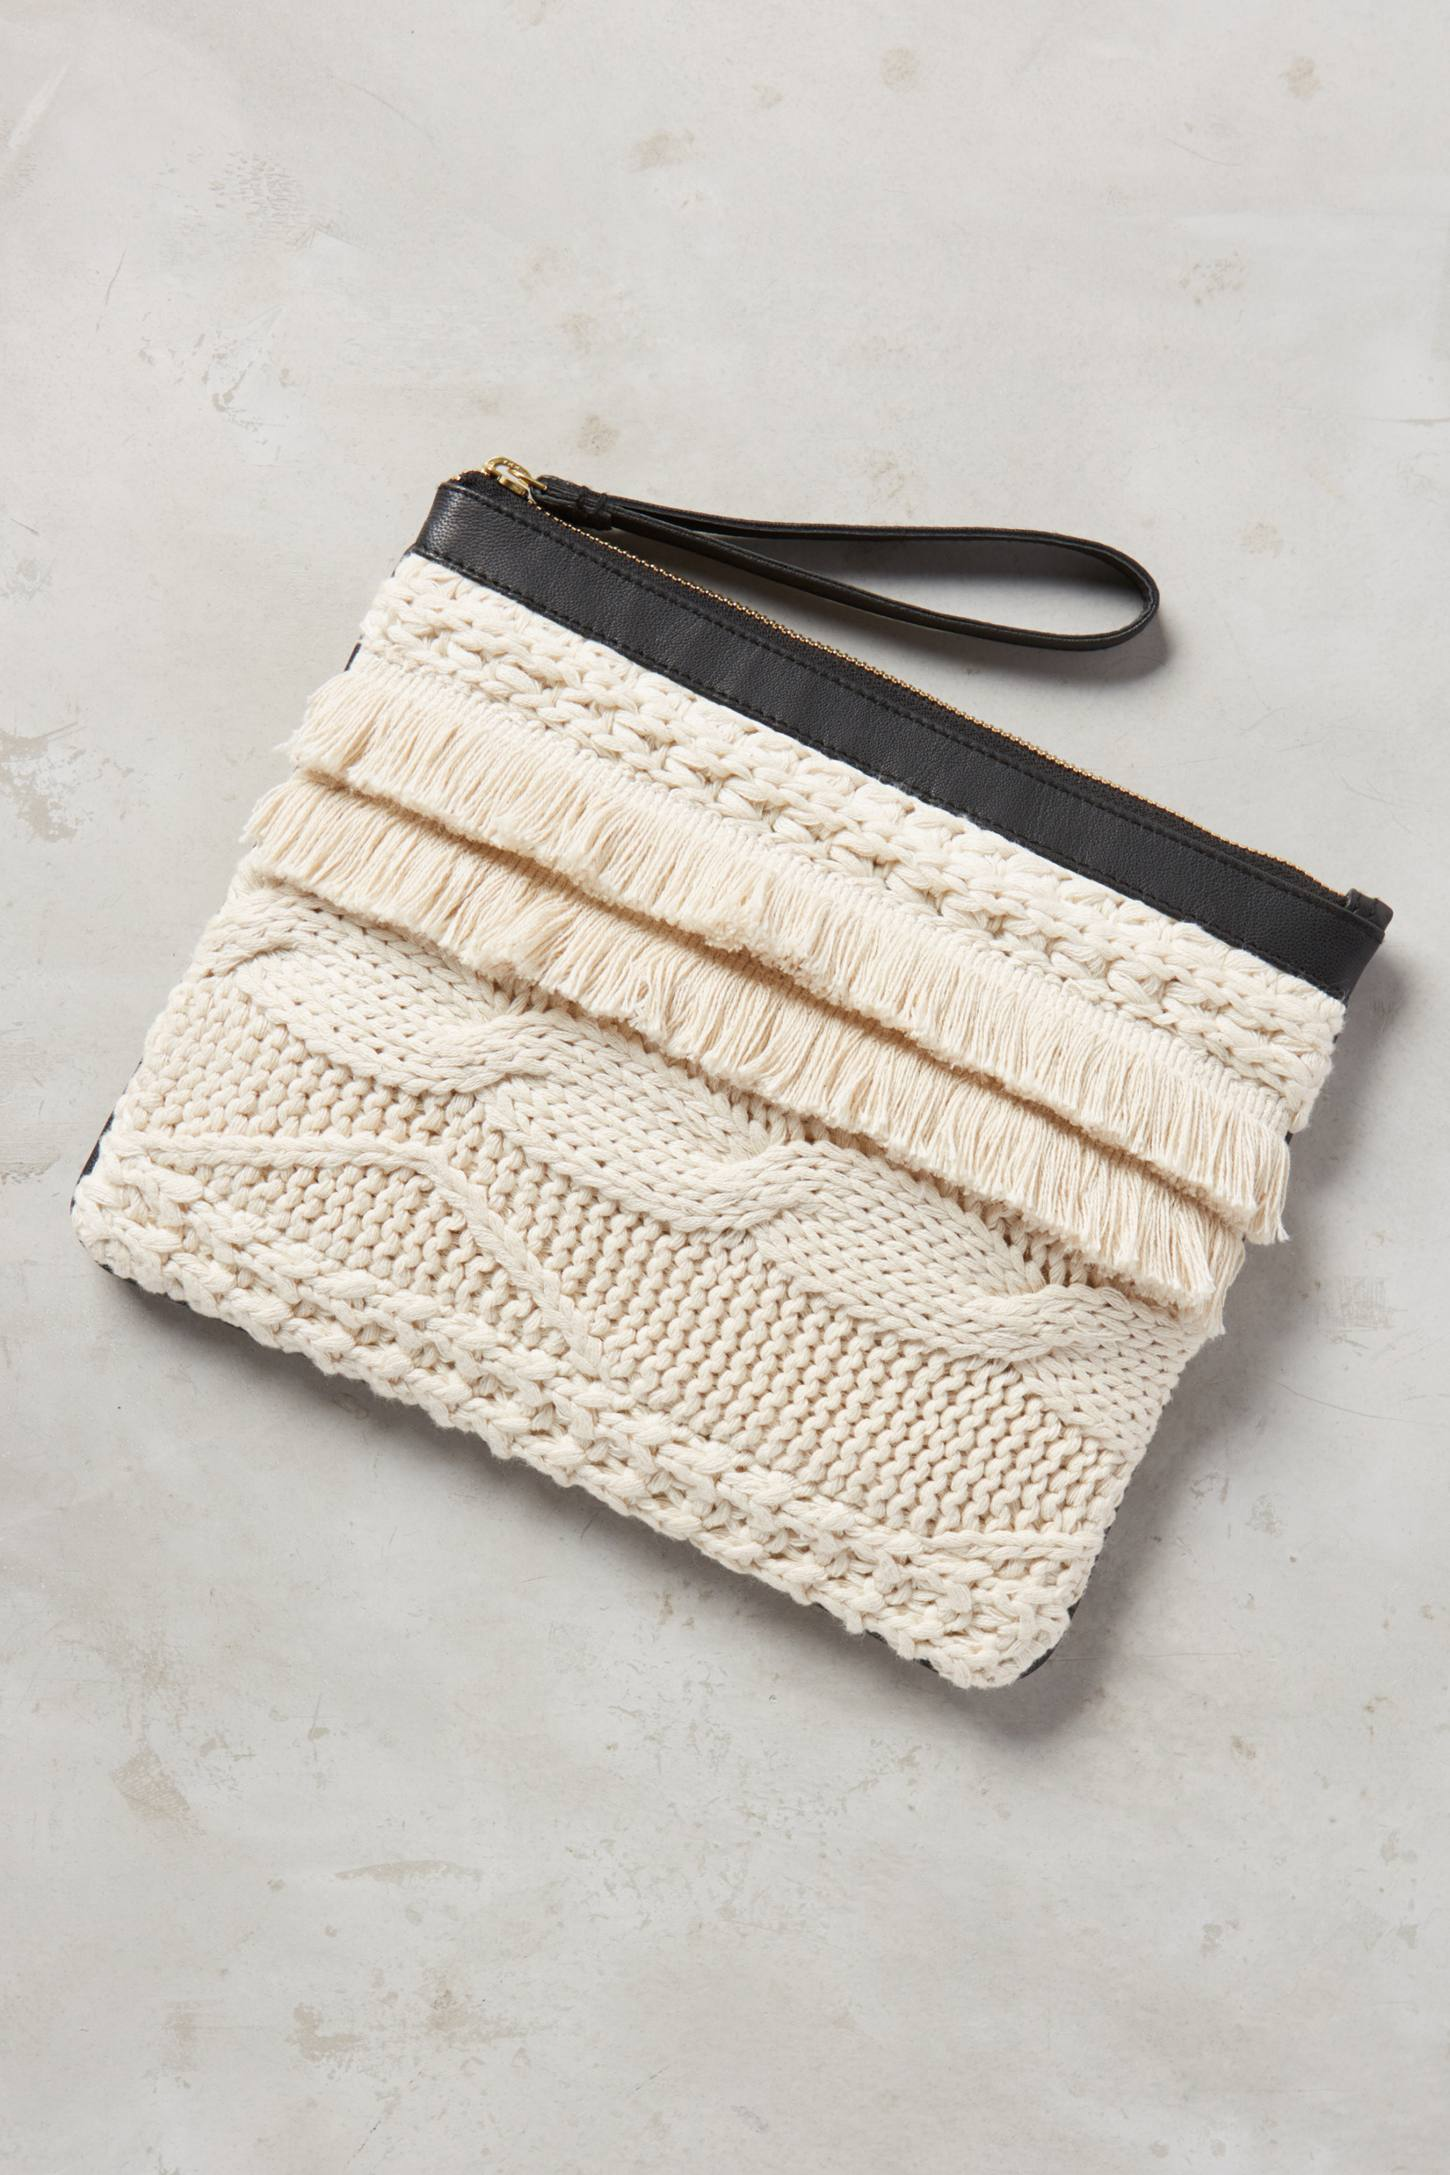 Luella Knitwork Pouch